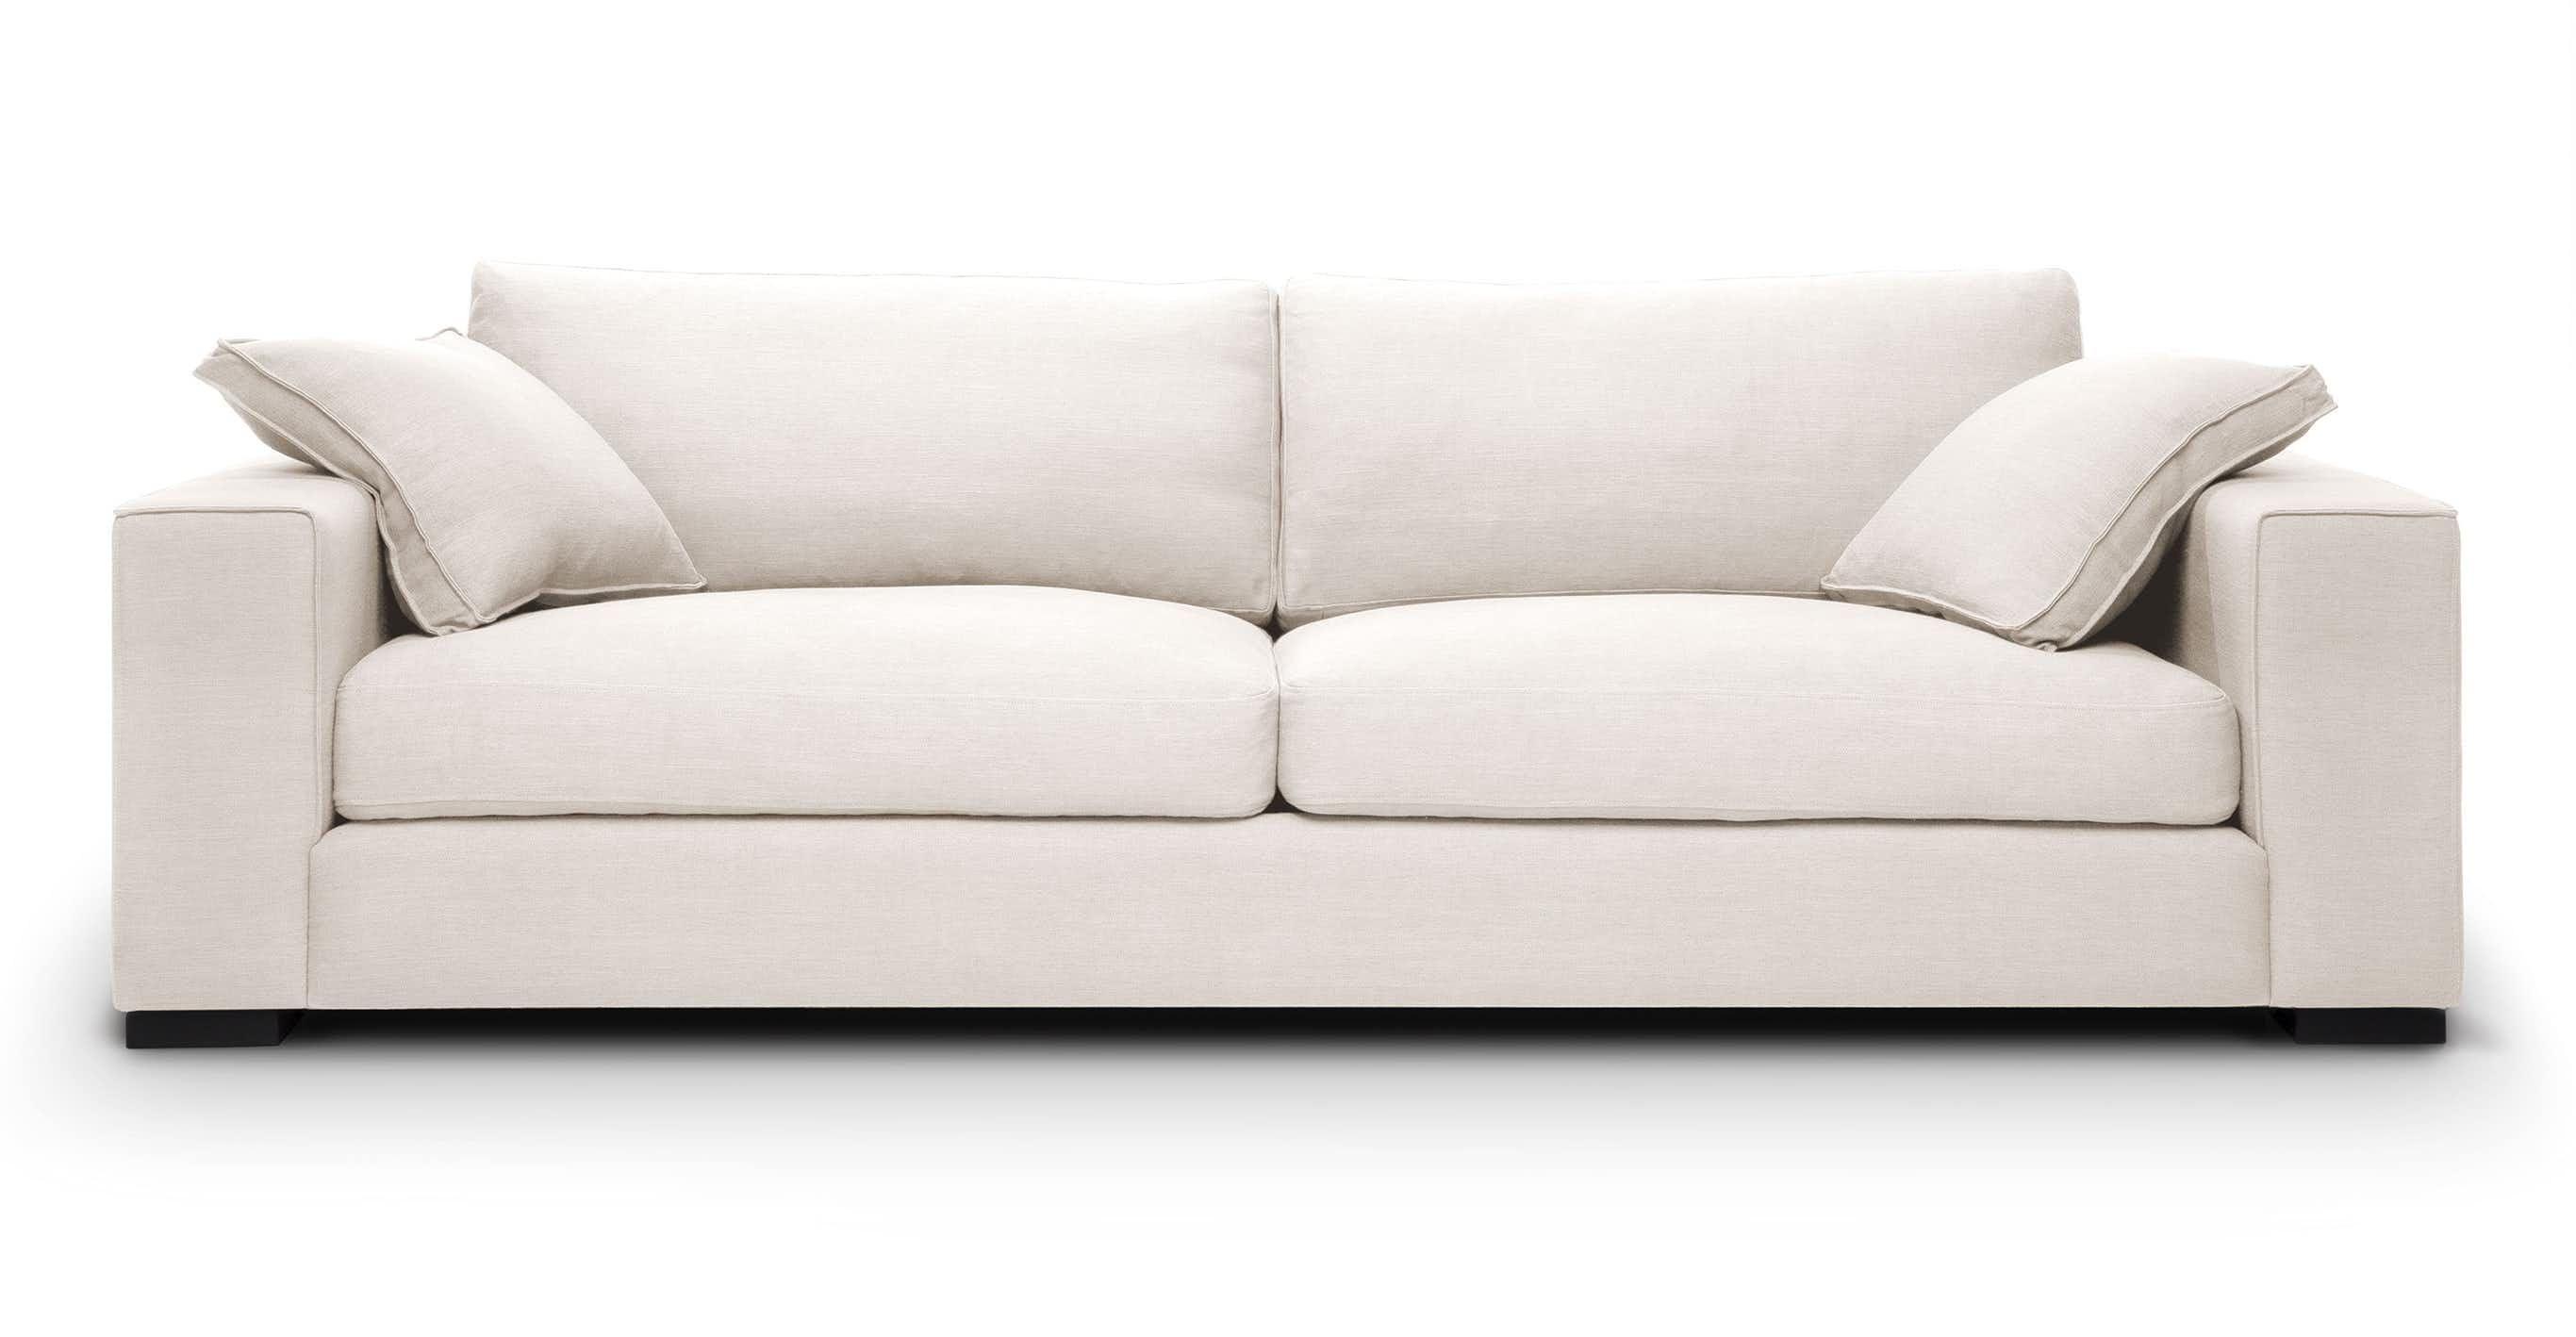 Sitka Quartz White Sofa White Sofas Modern Sofa Contemporary Sofa